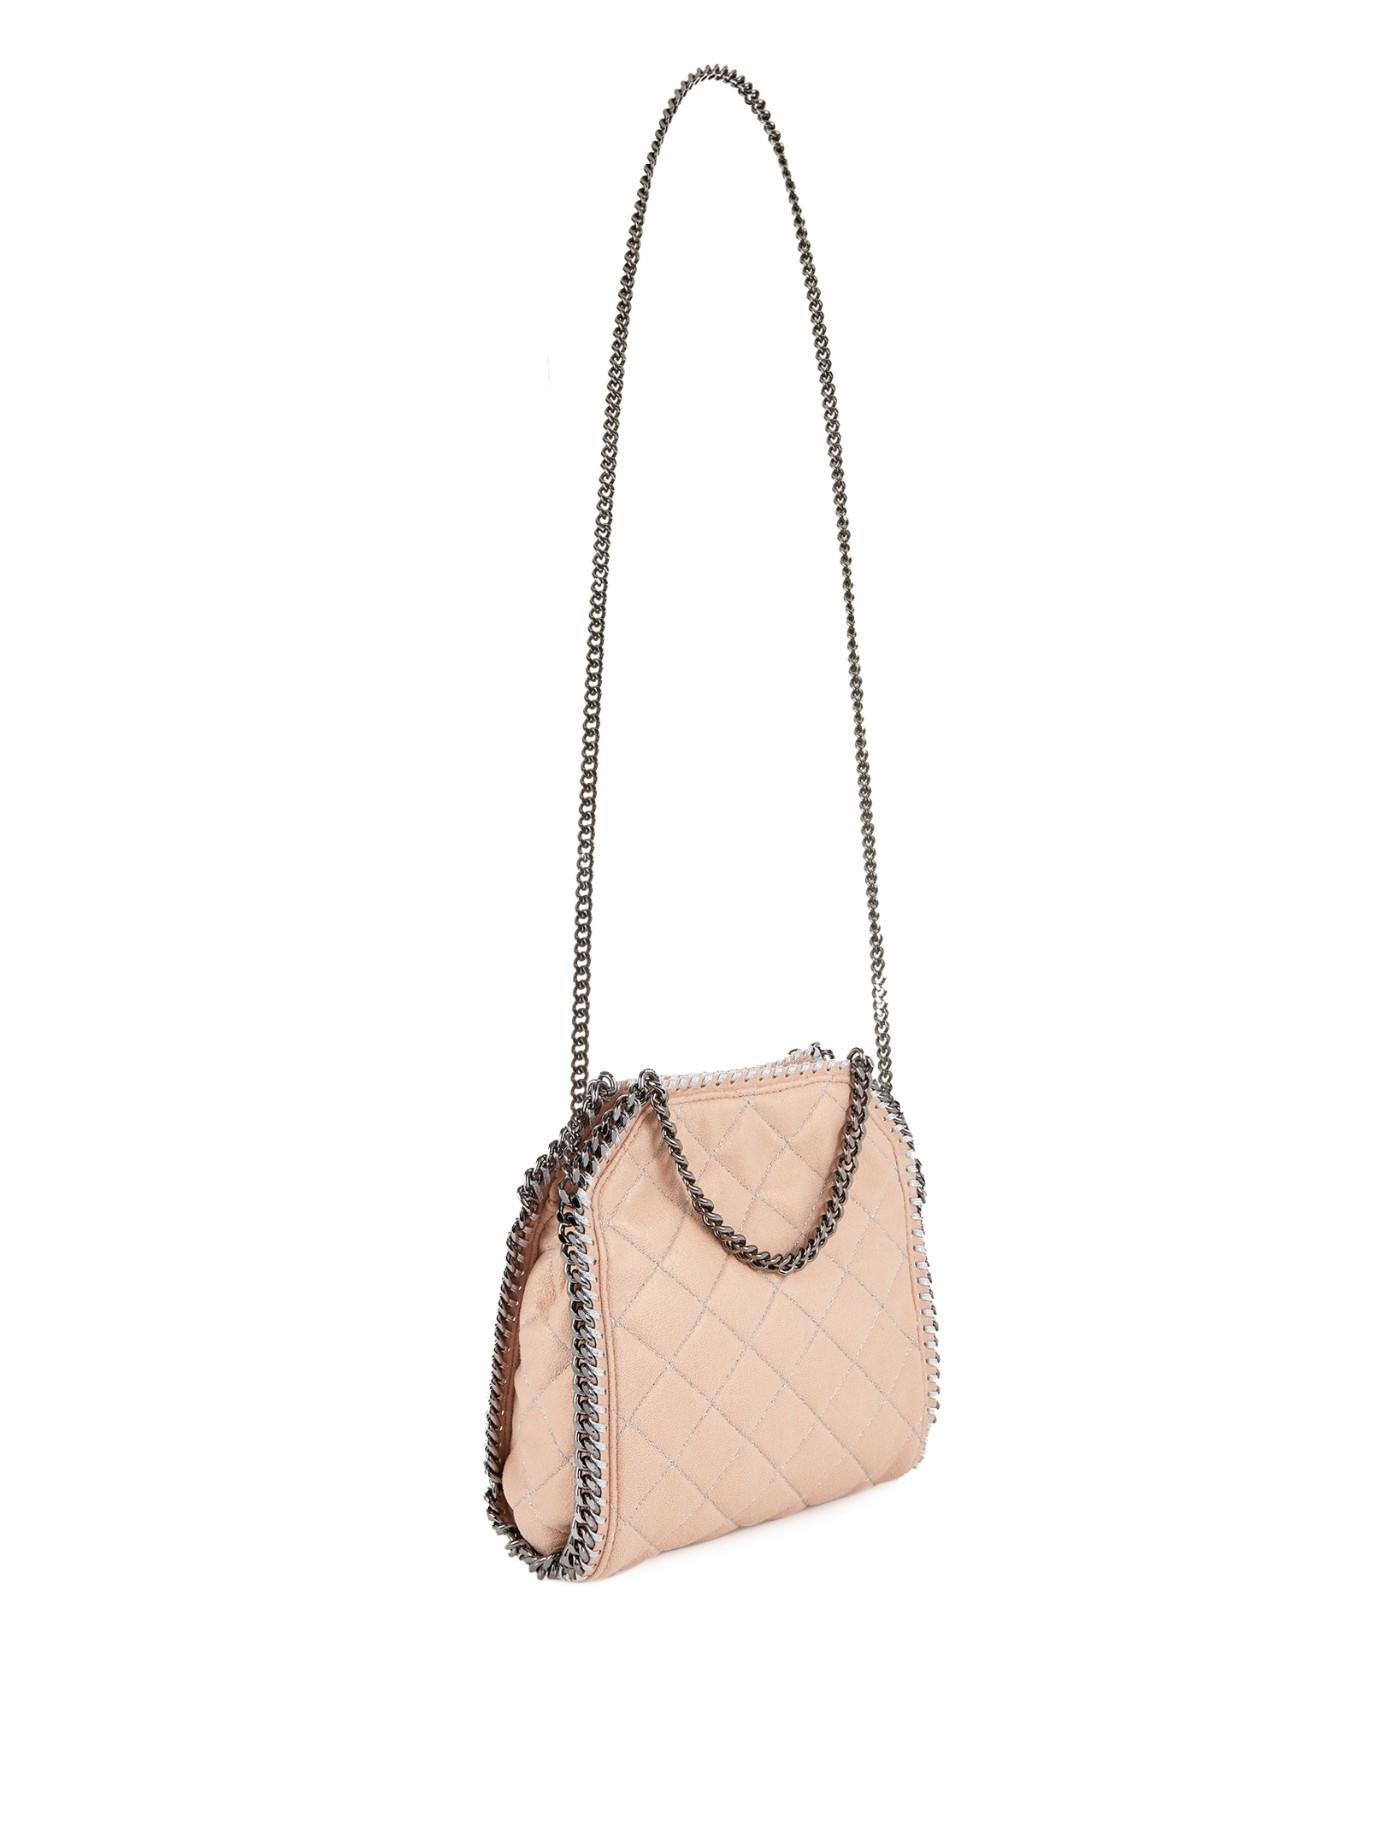 21154861e374 Lyst - Stella McCartney Falabella Mini Quilted Cross-Body Bag in Natural